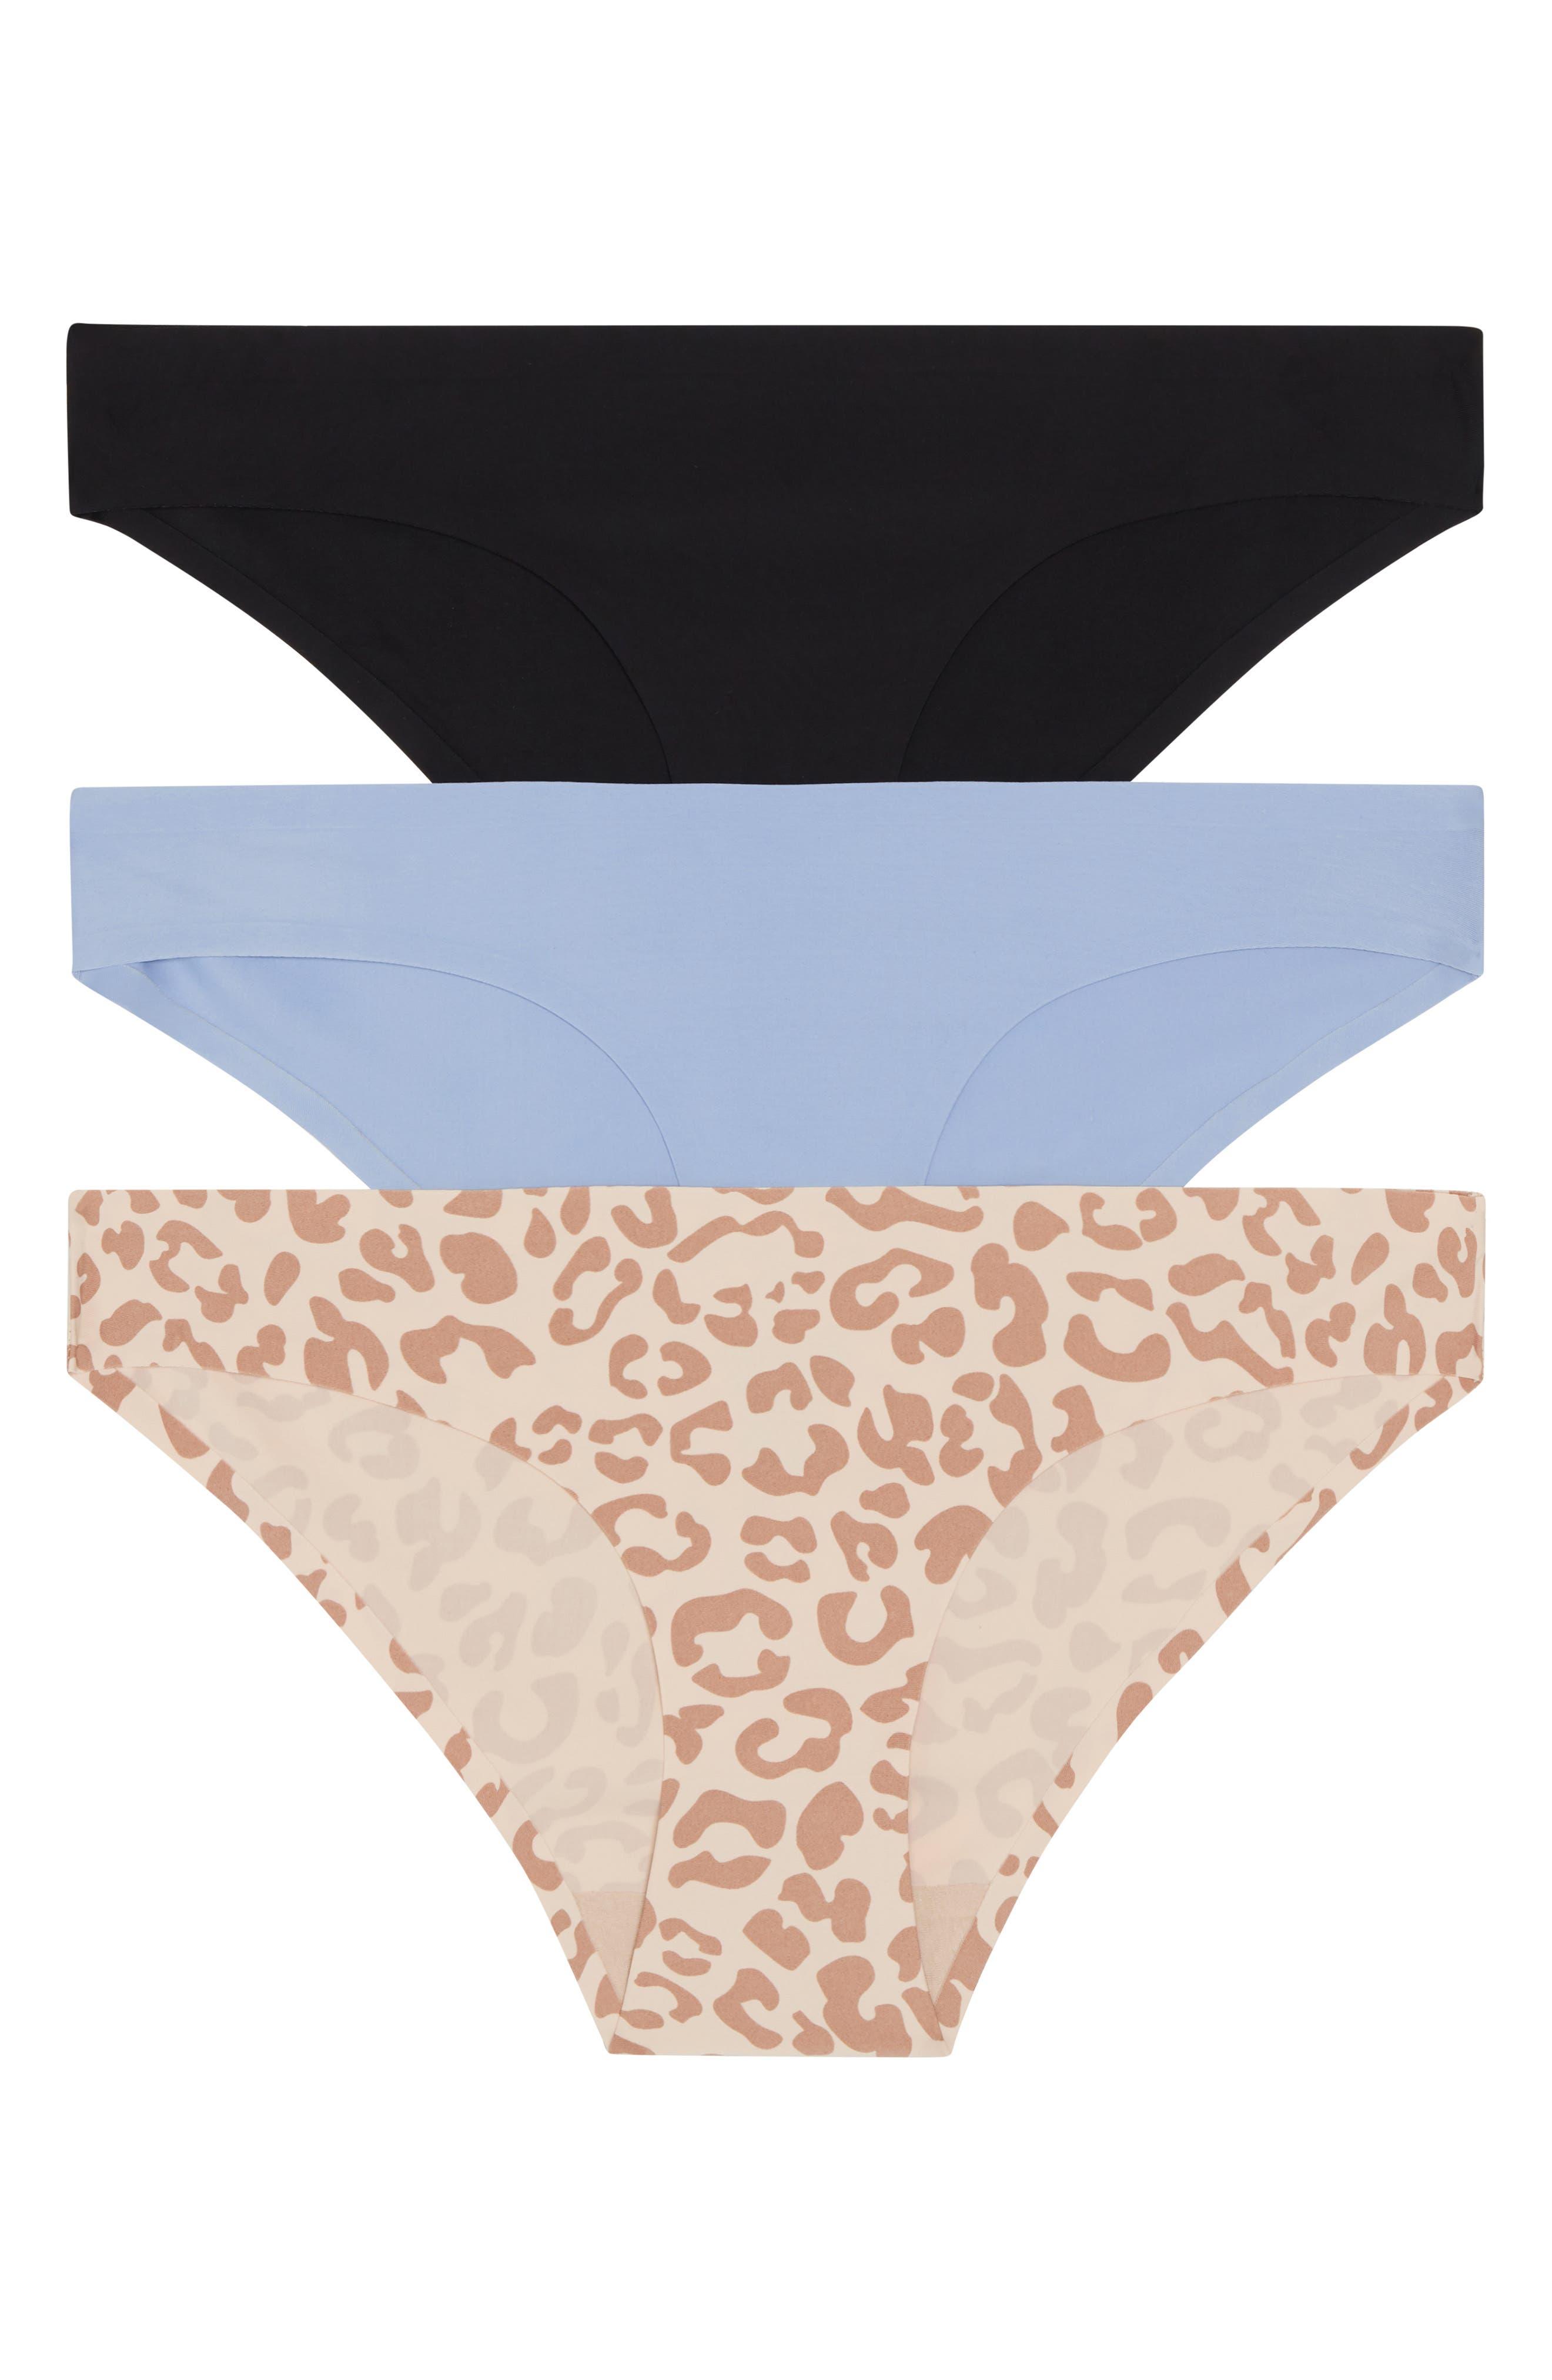 Skinz 3-Pack Hipster Panties